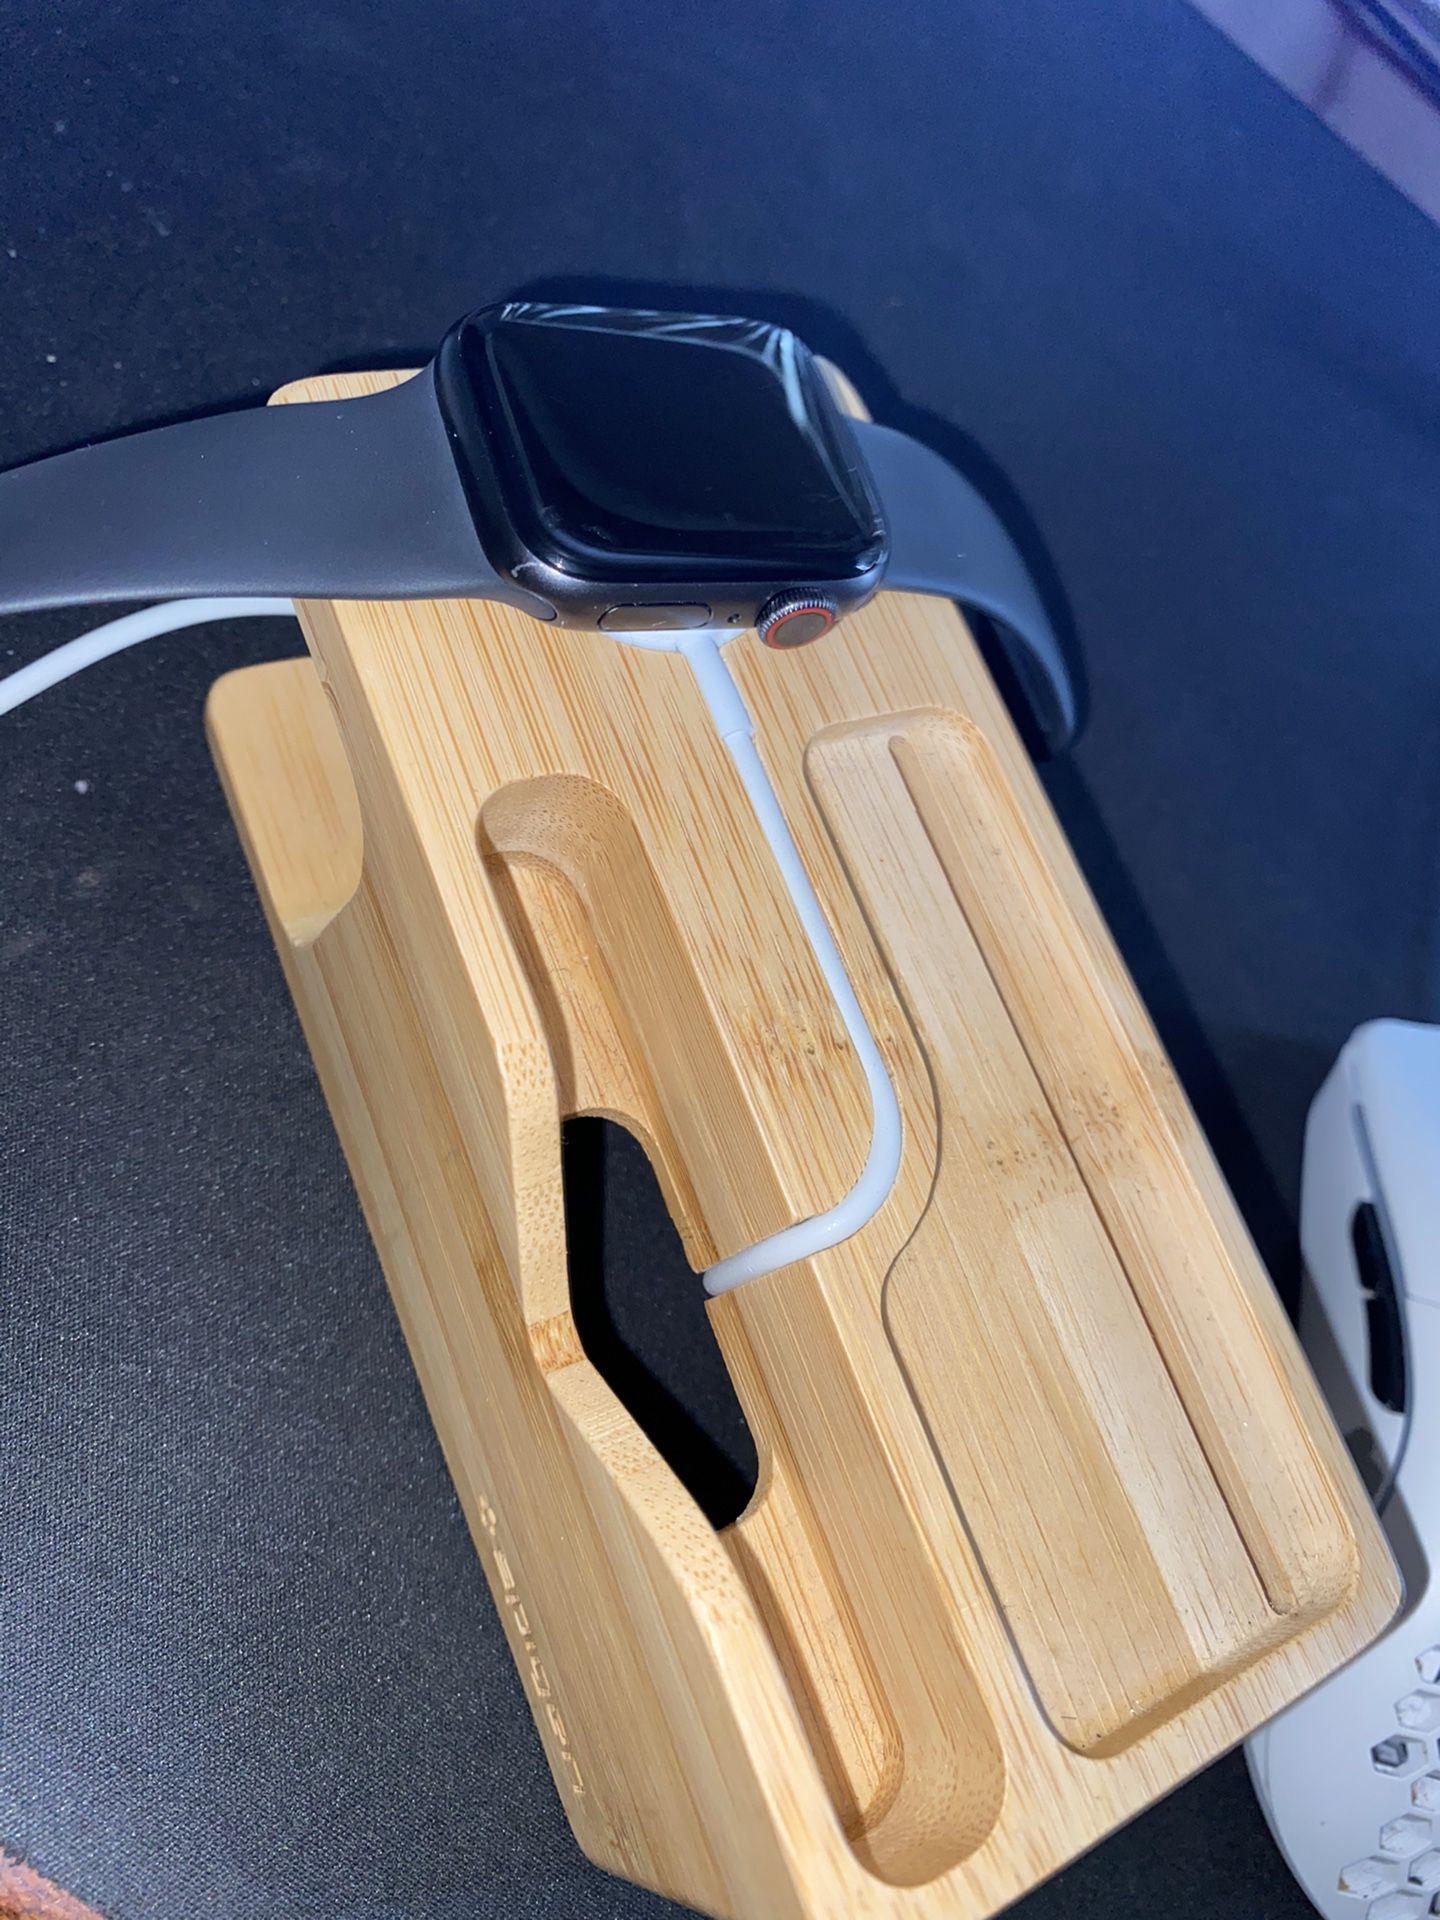 Apple Watch Series 5 Cellular Model 40mm